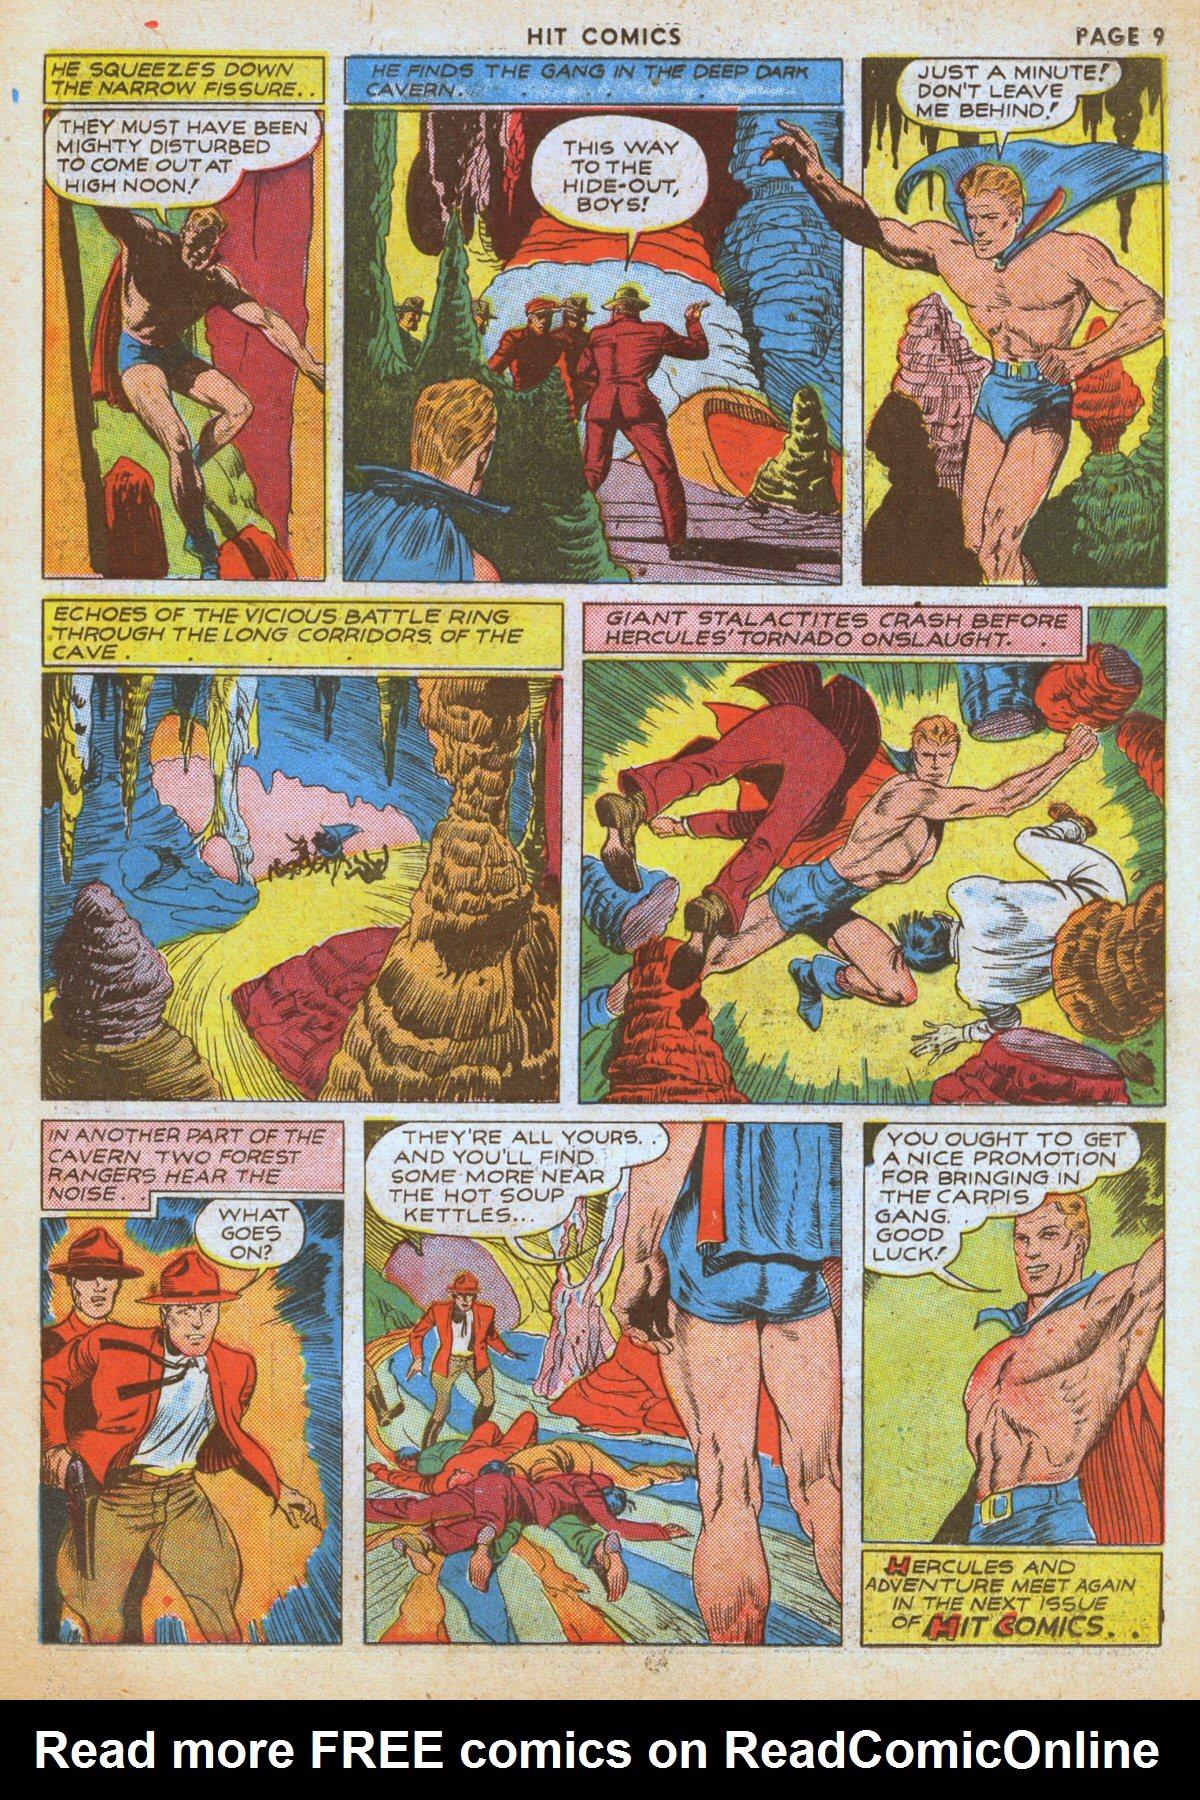 Read online Hit Comics comic -  Issue #12 - 11